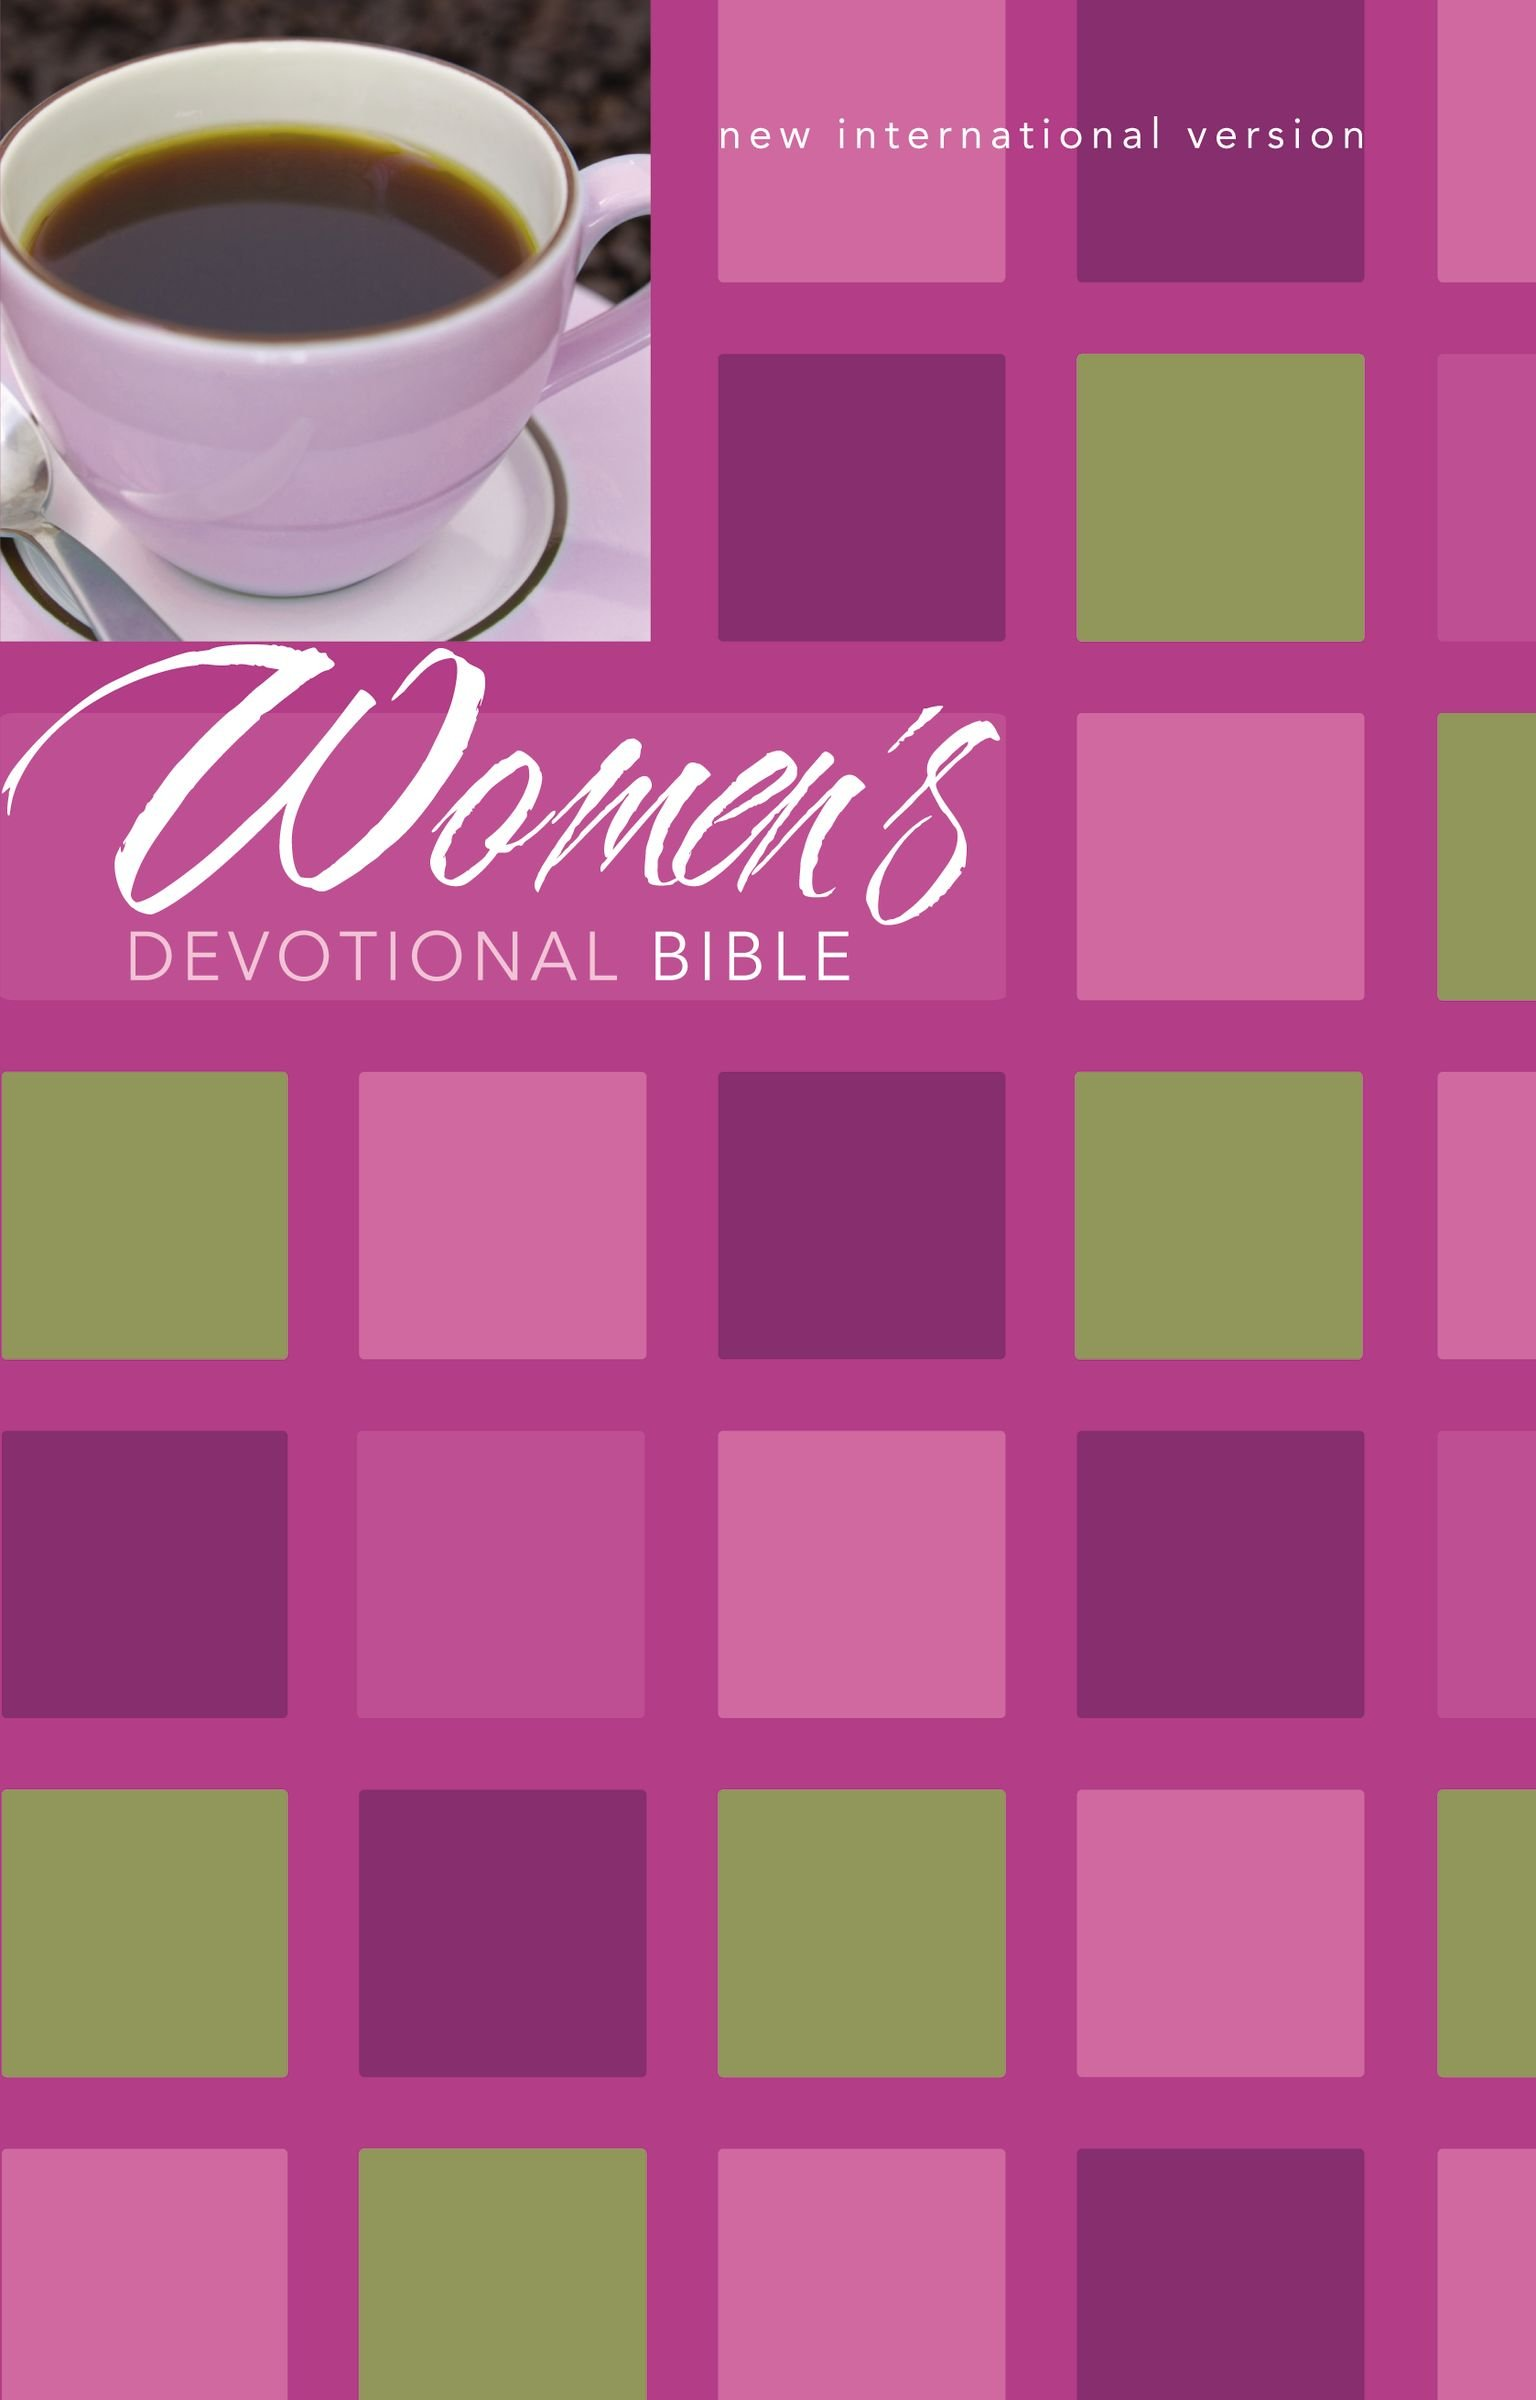 NIV Womens Devotional Bible Hardcover product image